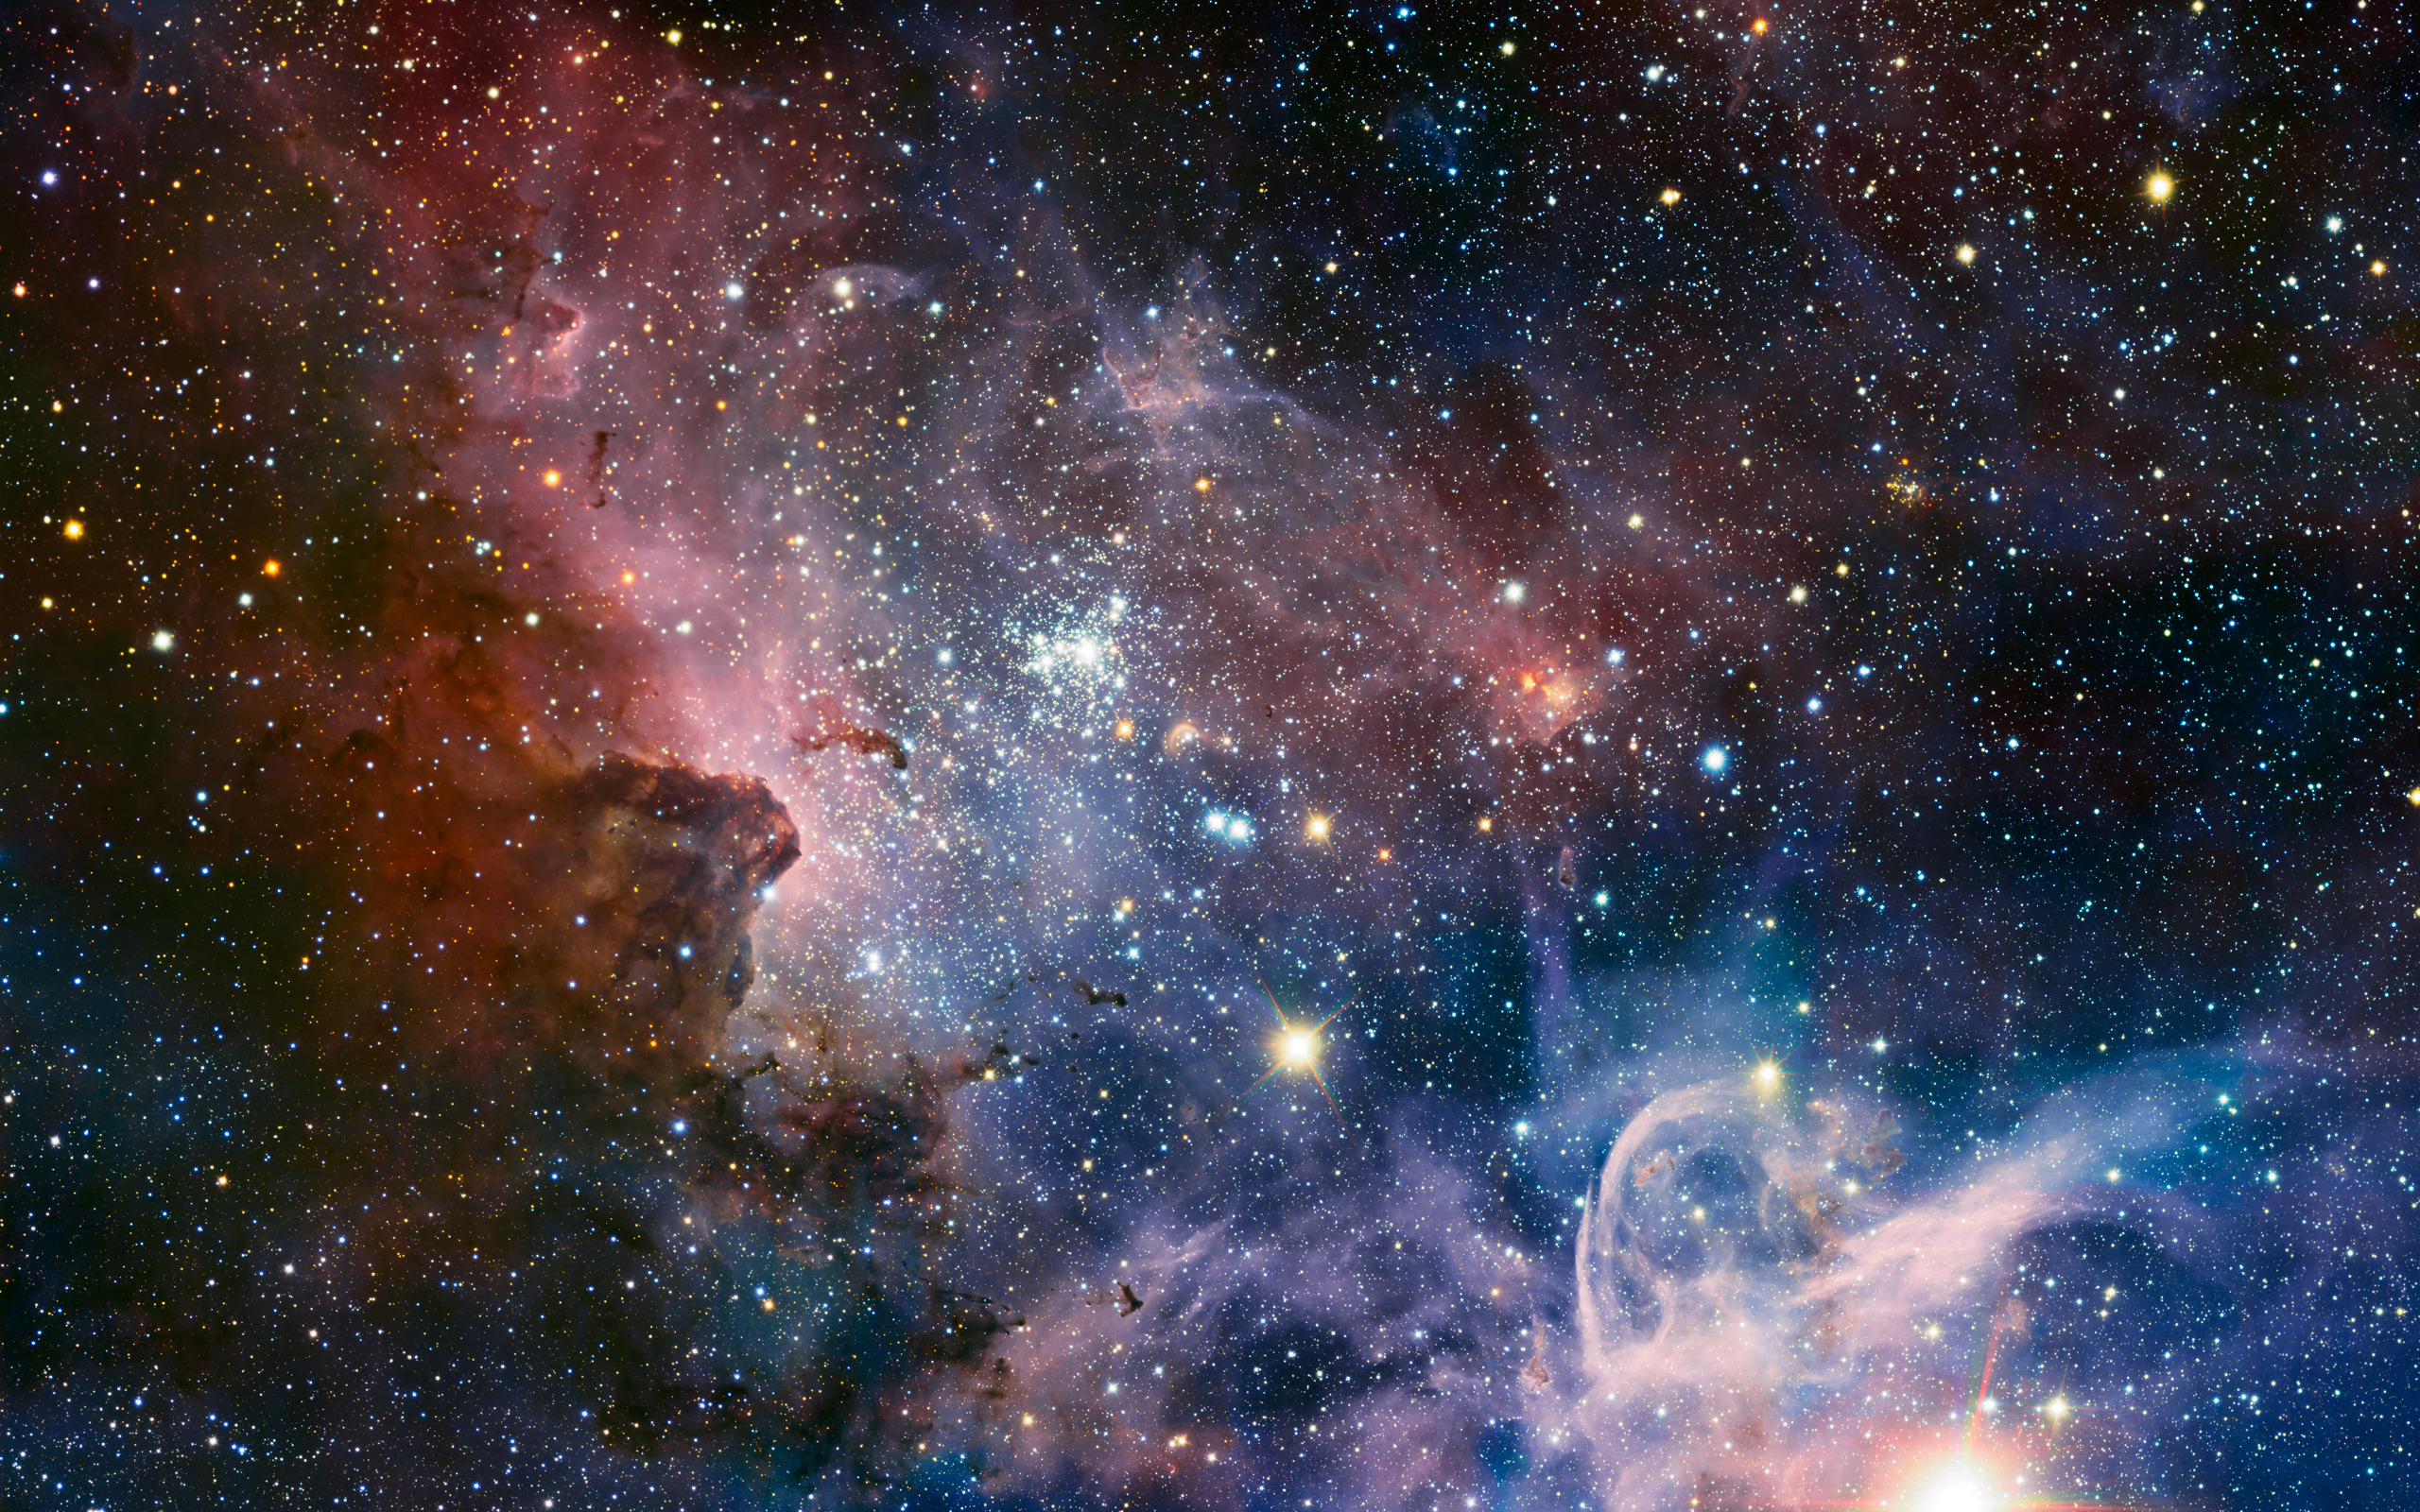 Nebula Wallpaper 2560x1600px 860617 2560x1600